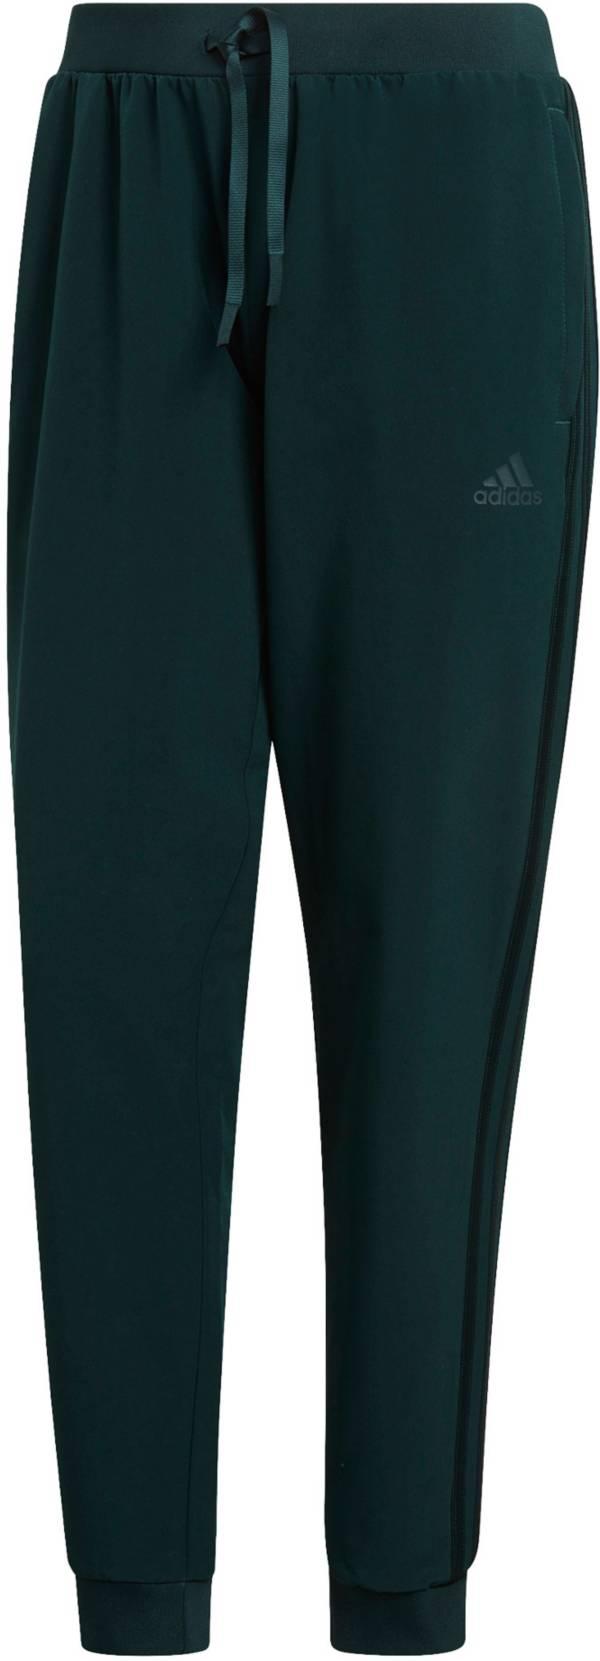 adidas Women's Tiro Woven Pants product image